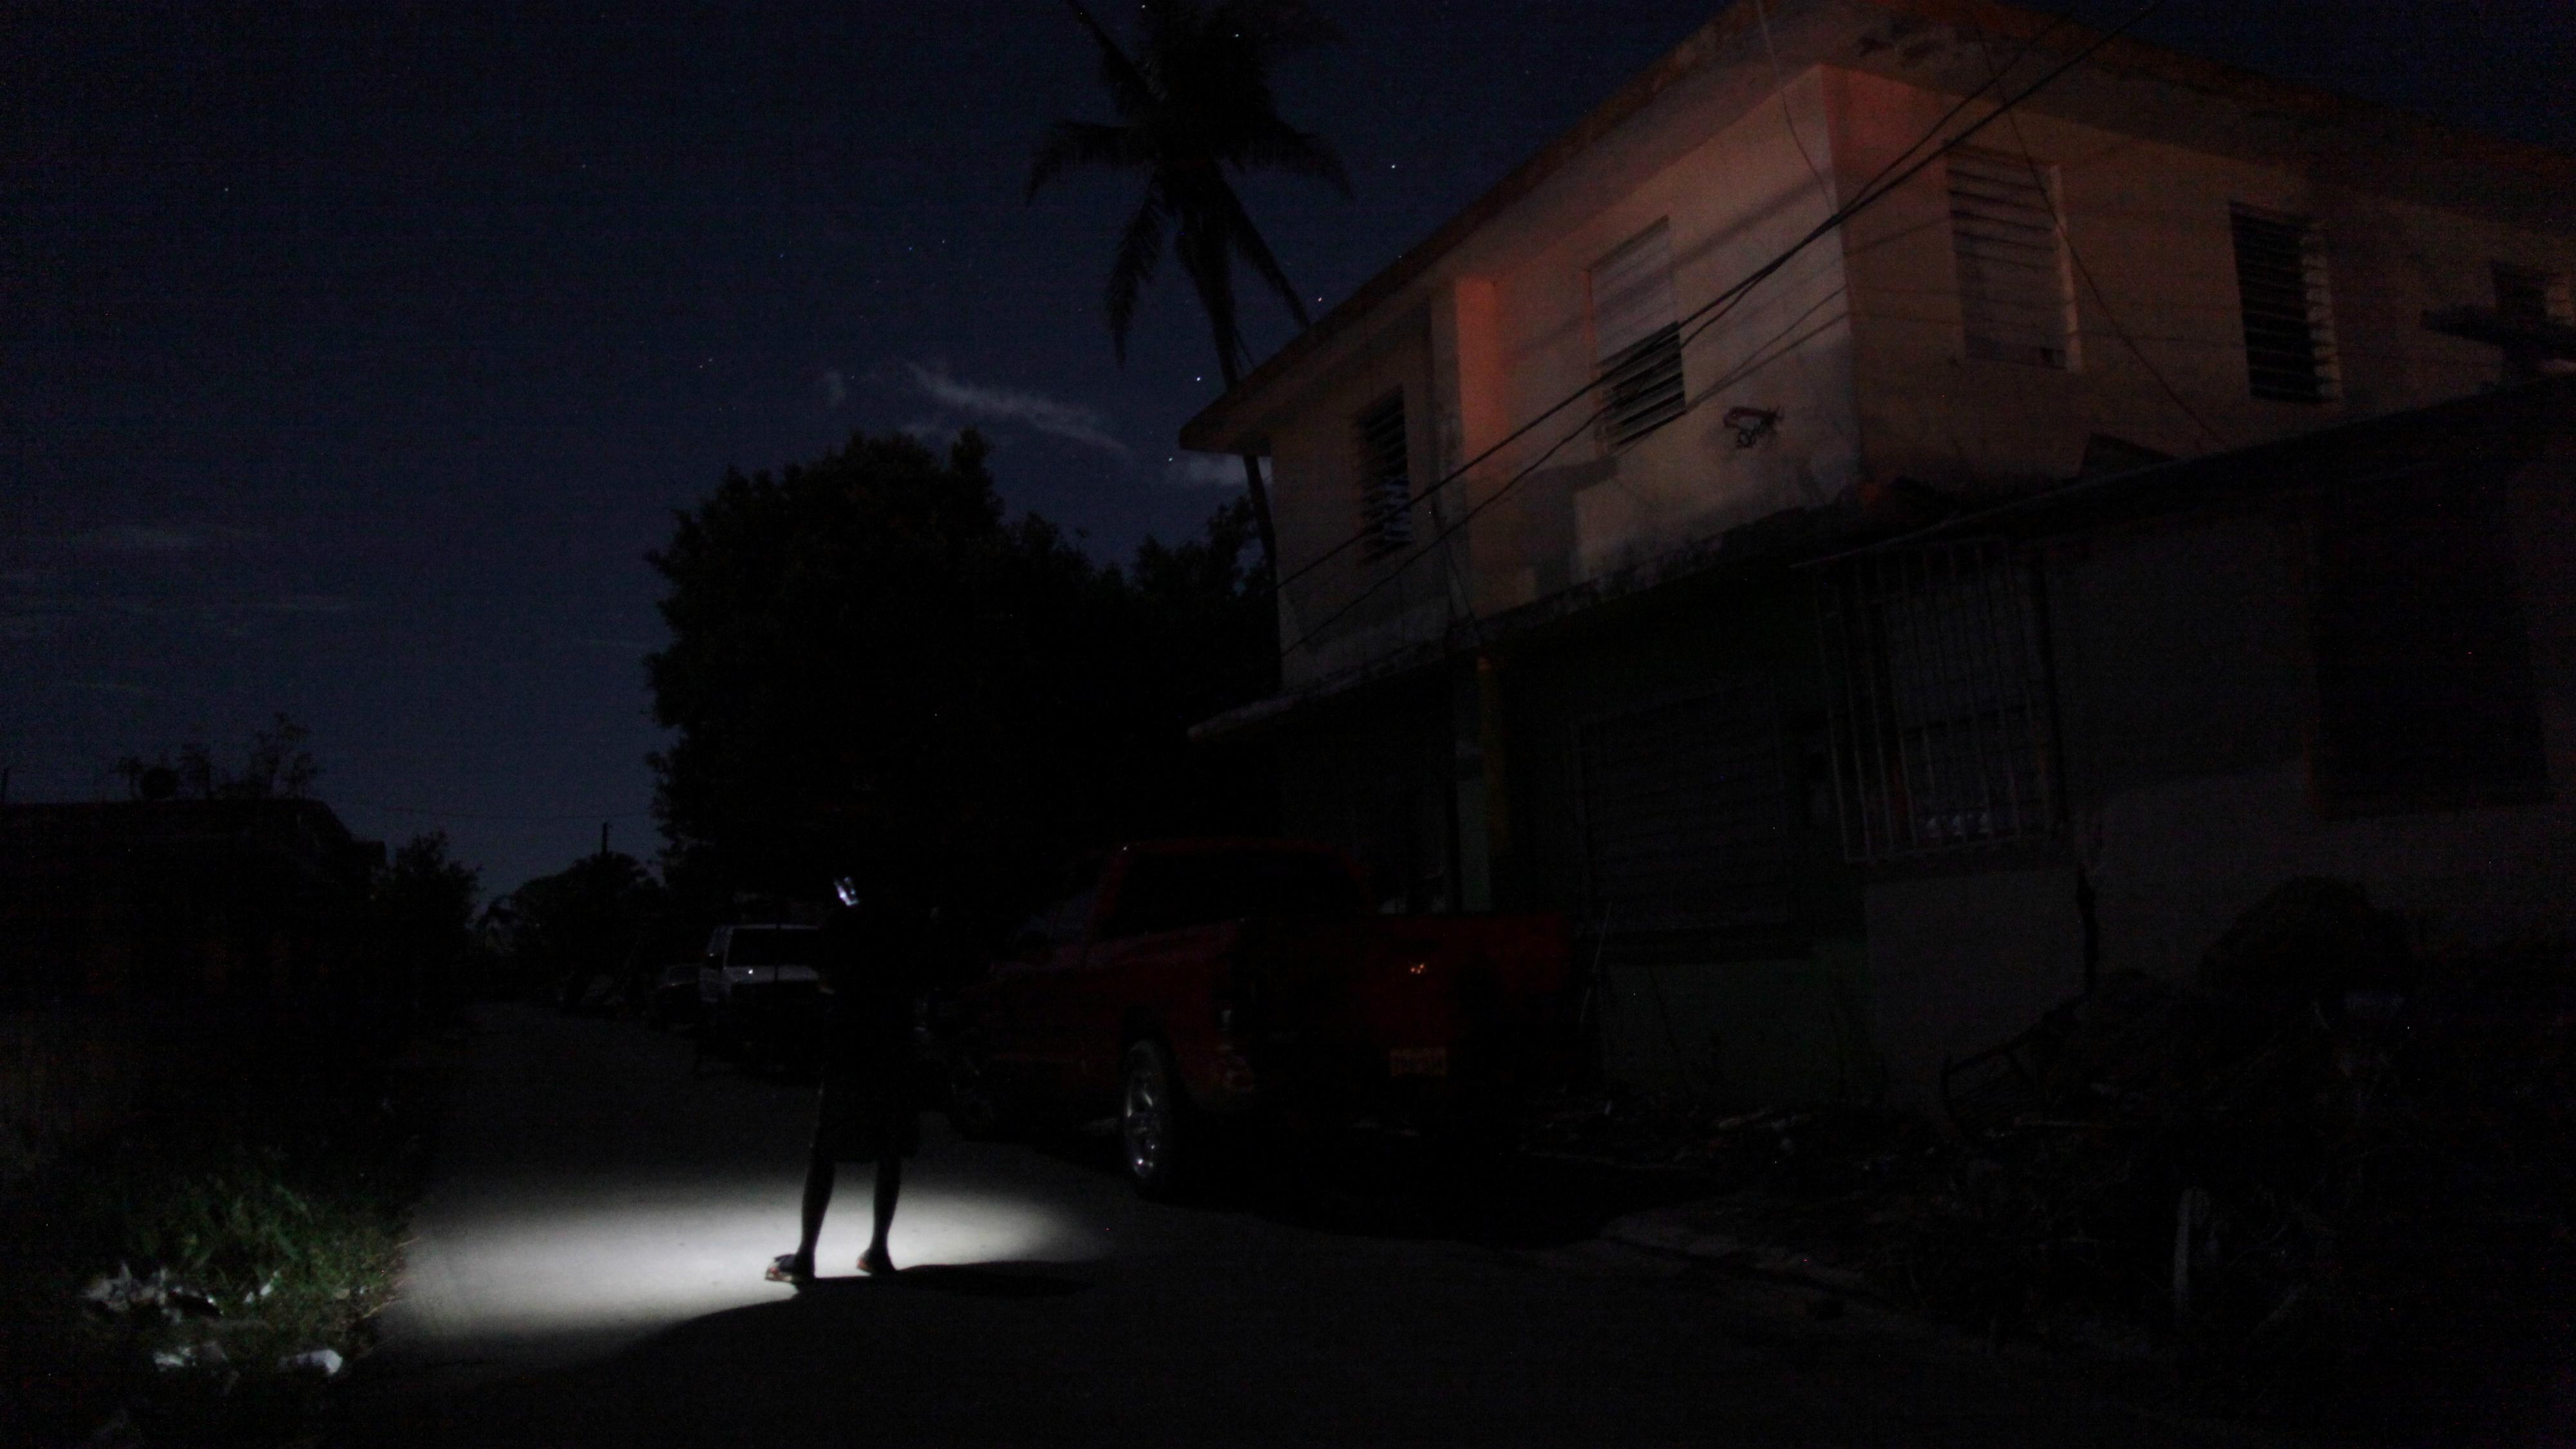 c-pr-house-RTS1HLY0-Alvin Baez